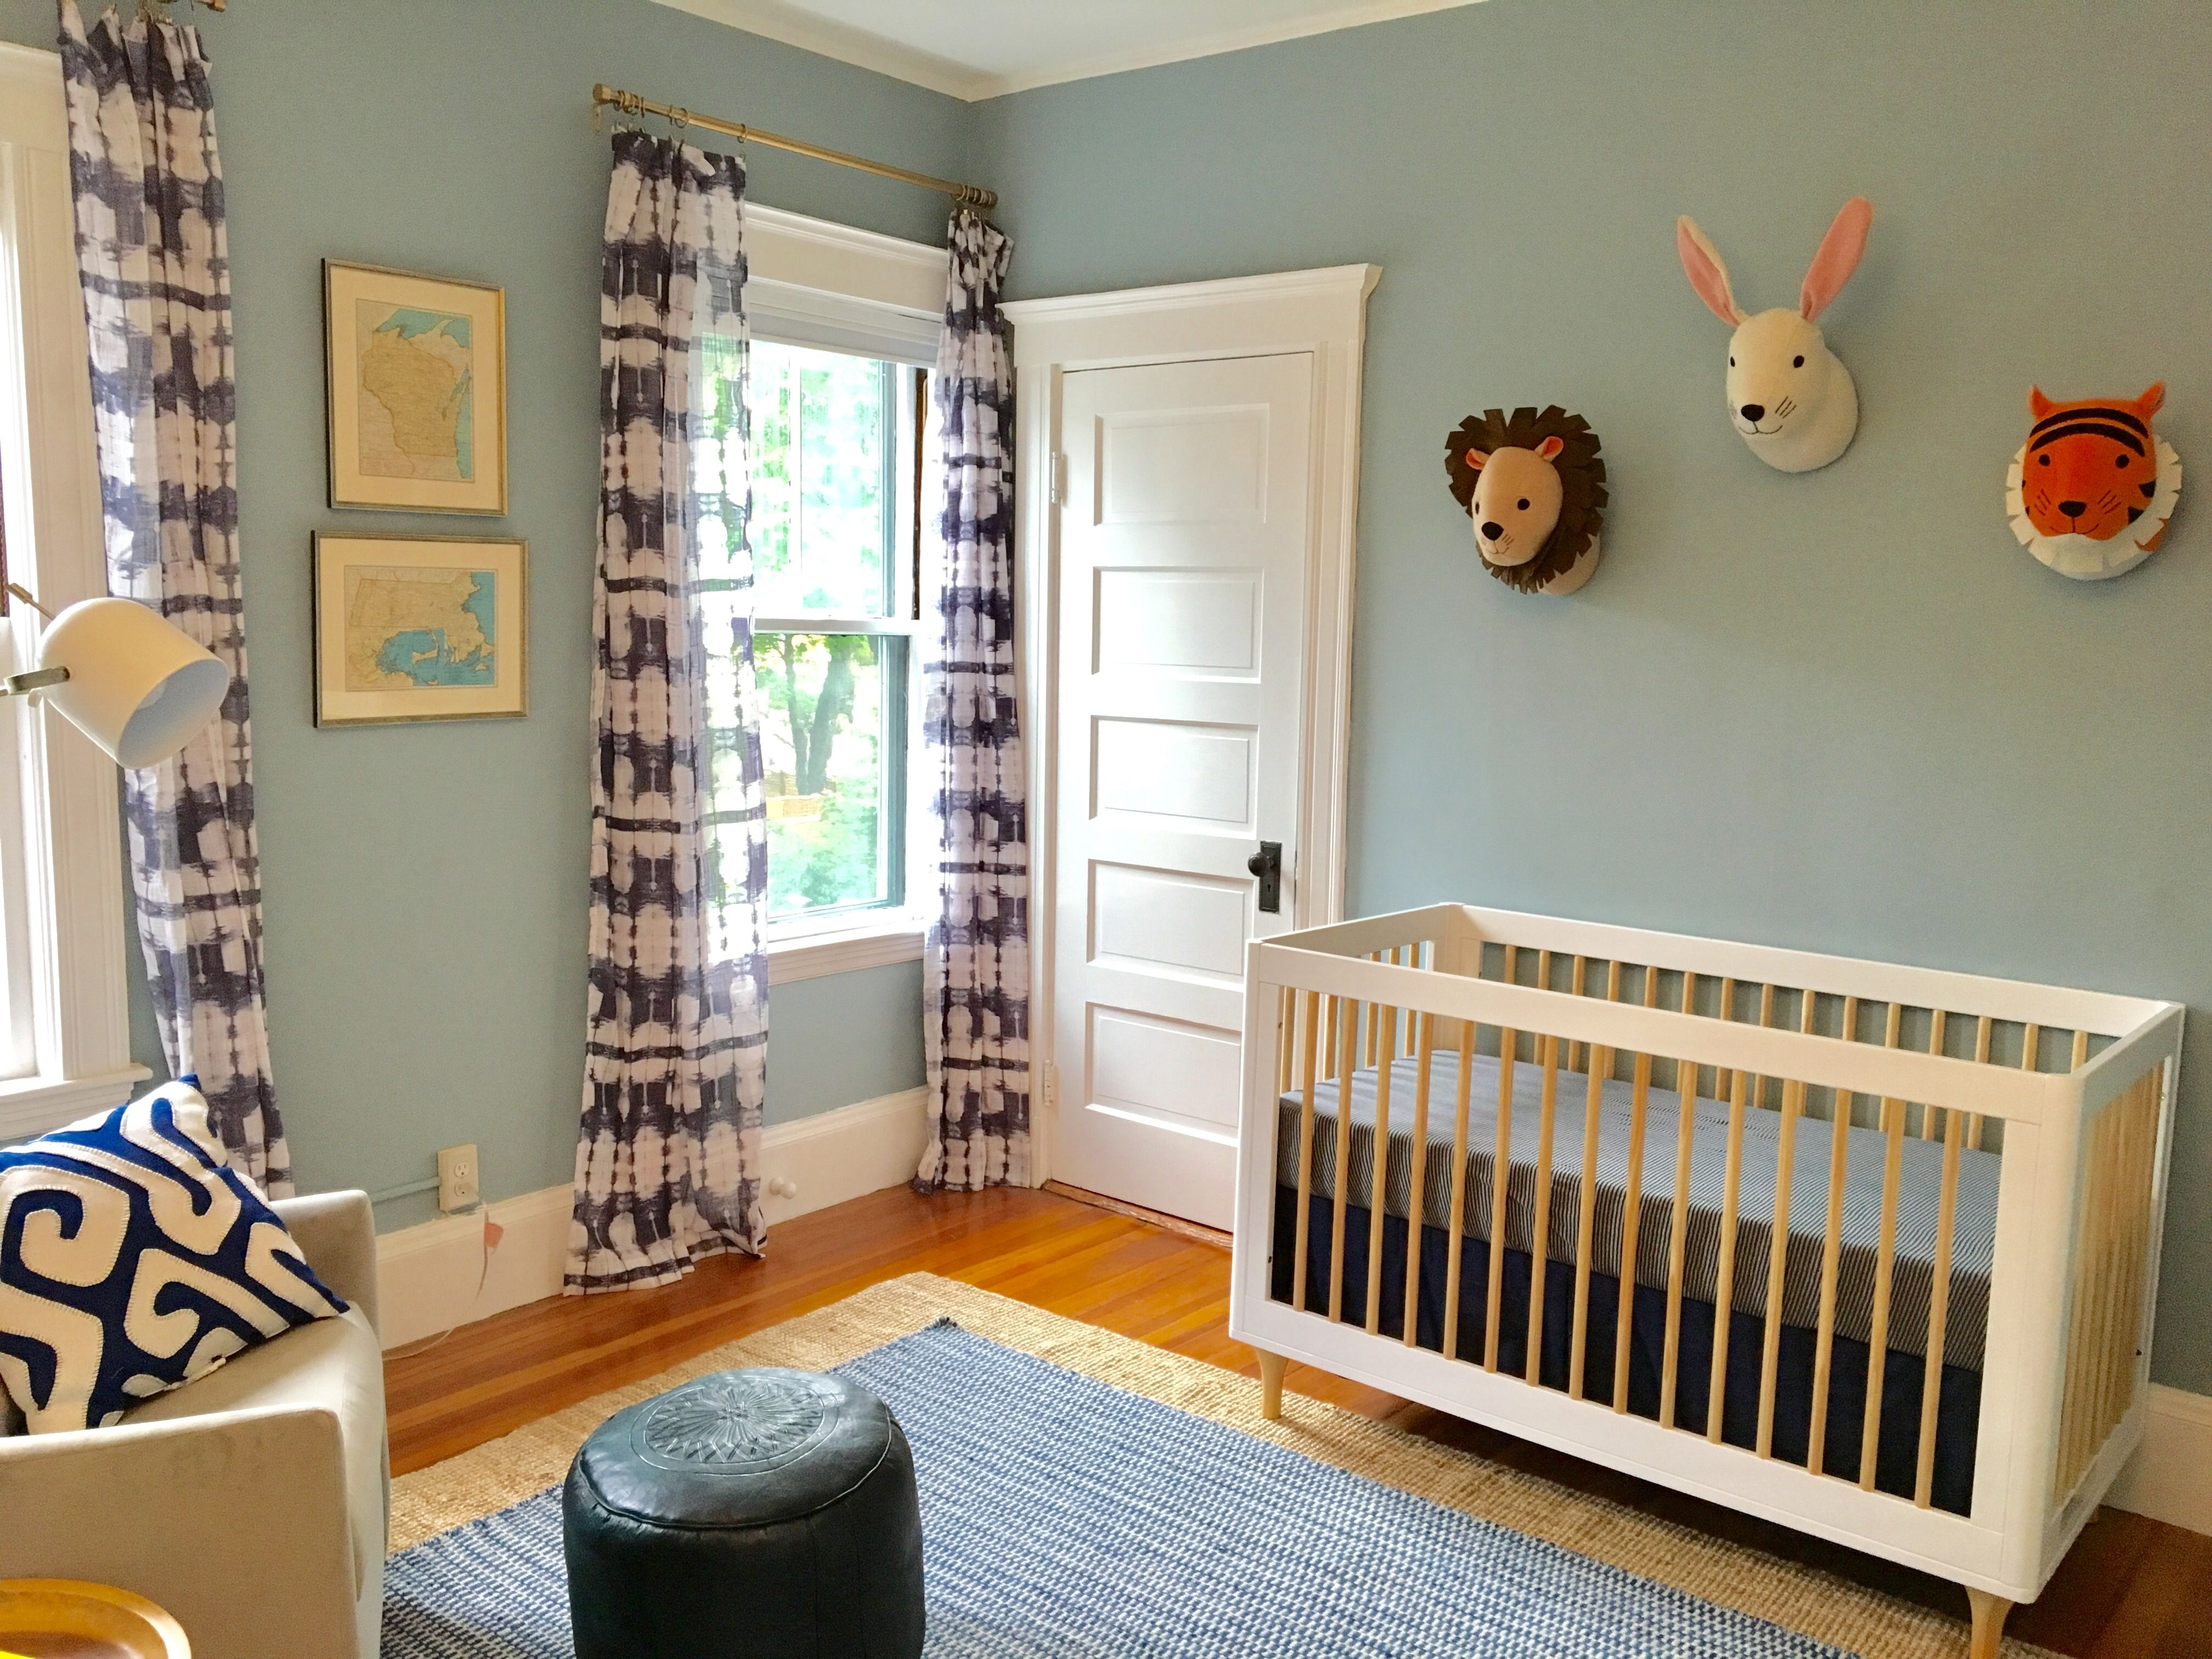 Babyletto crib, CB2 curtains Babyletto crib, Cribs, Home